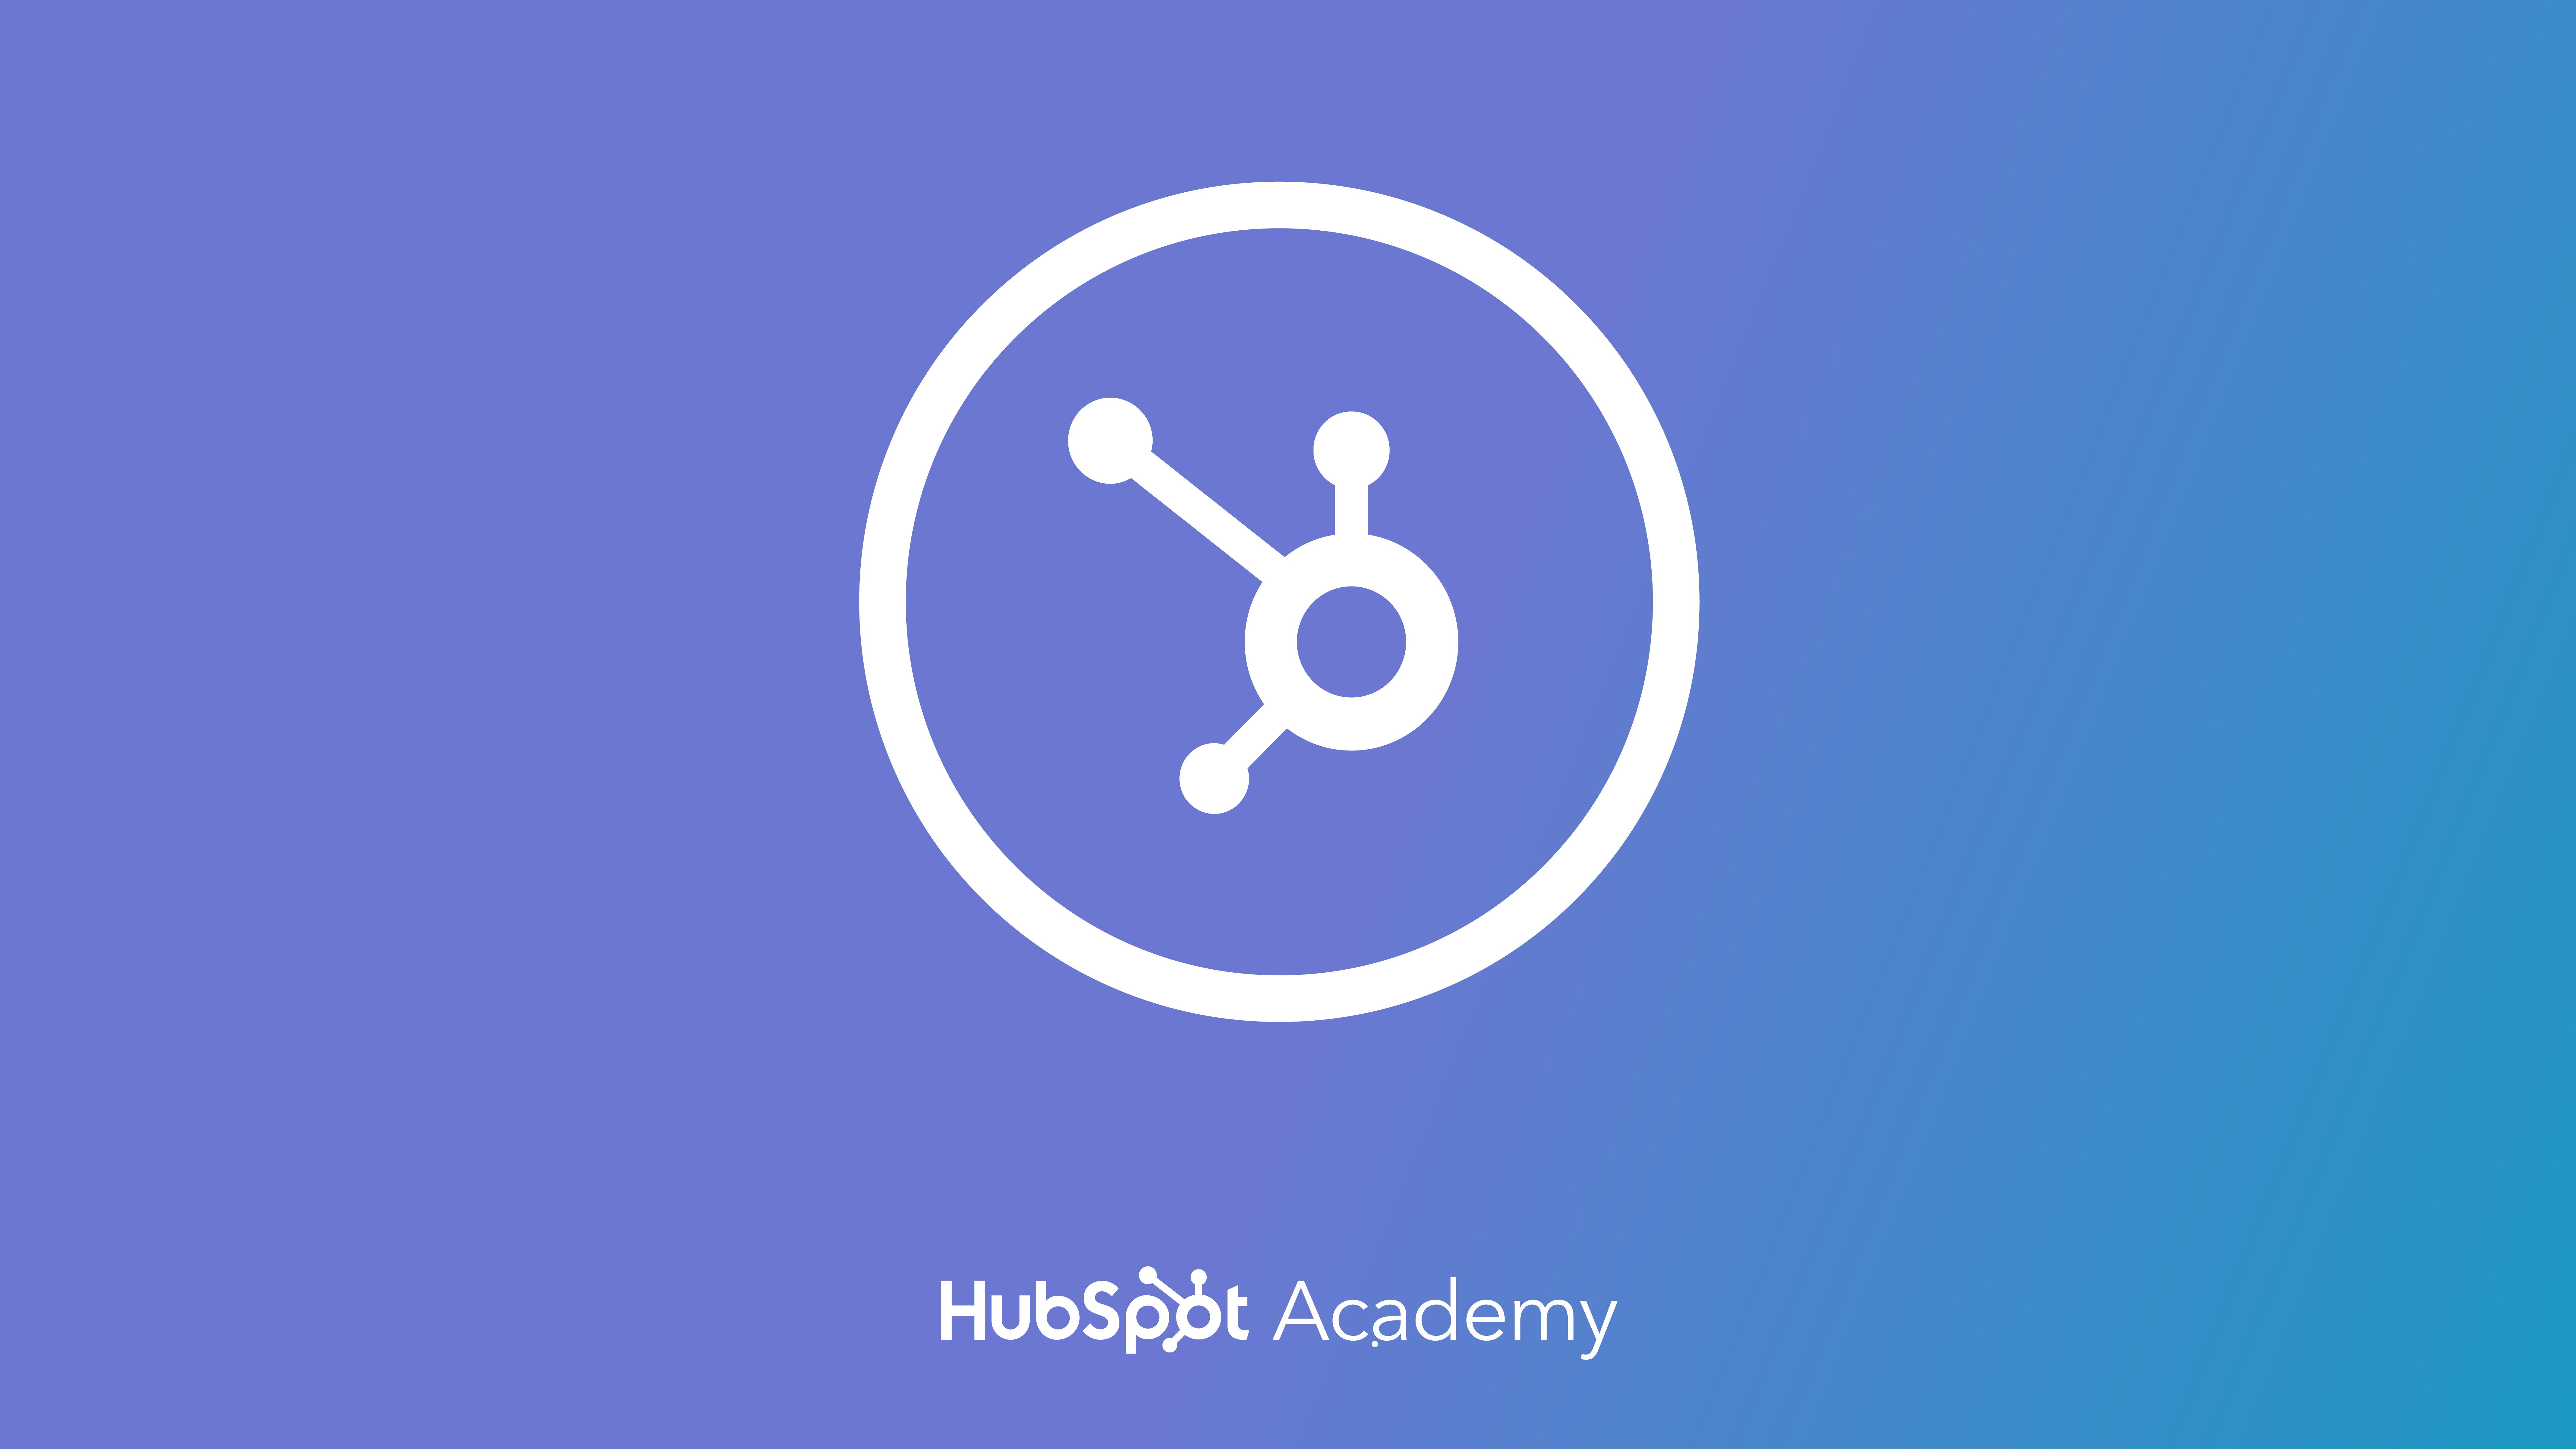 HubSpot Sales Software Certification course by HubSpot Academy